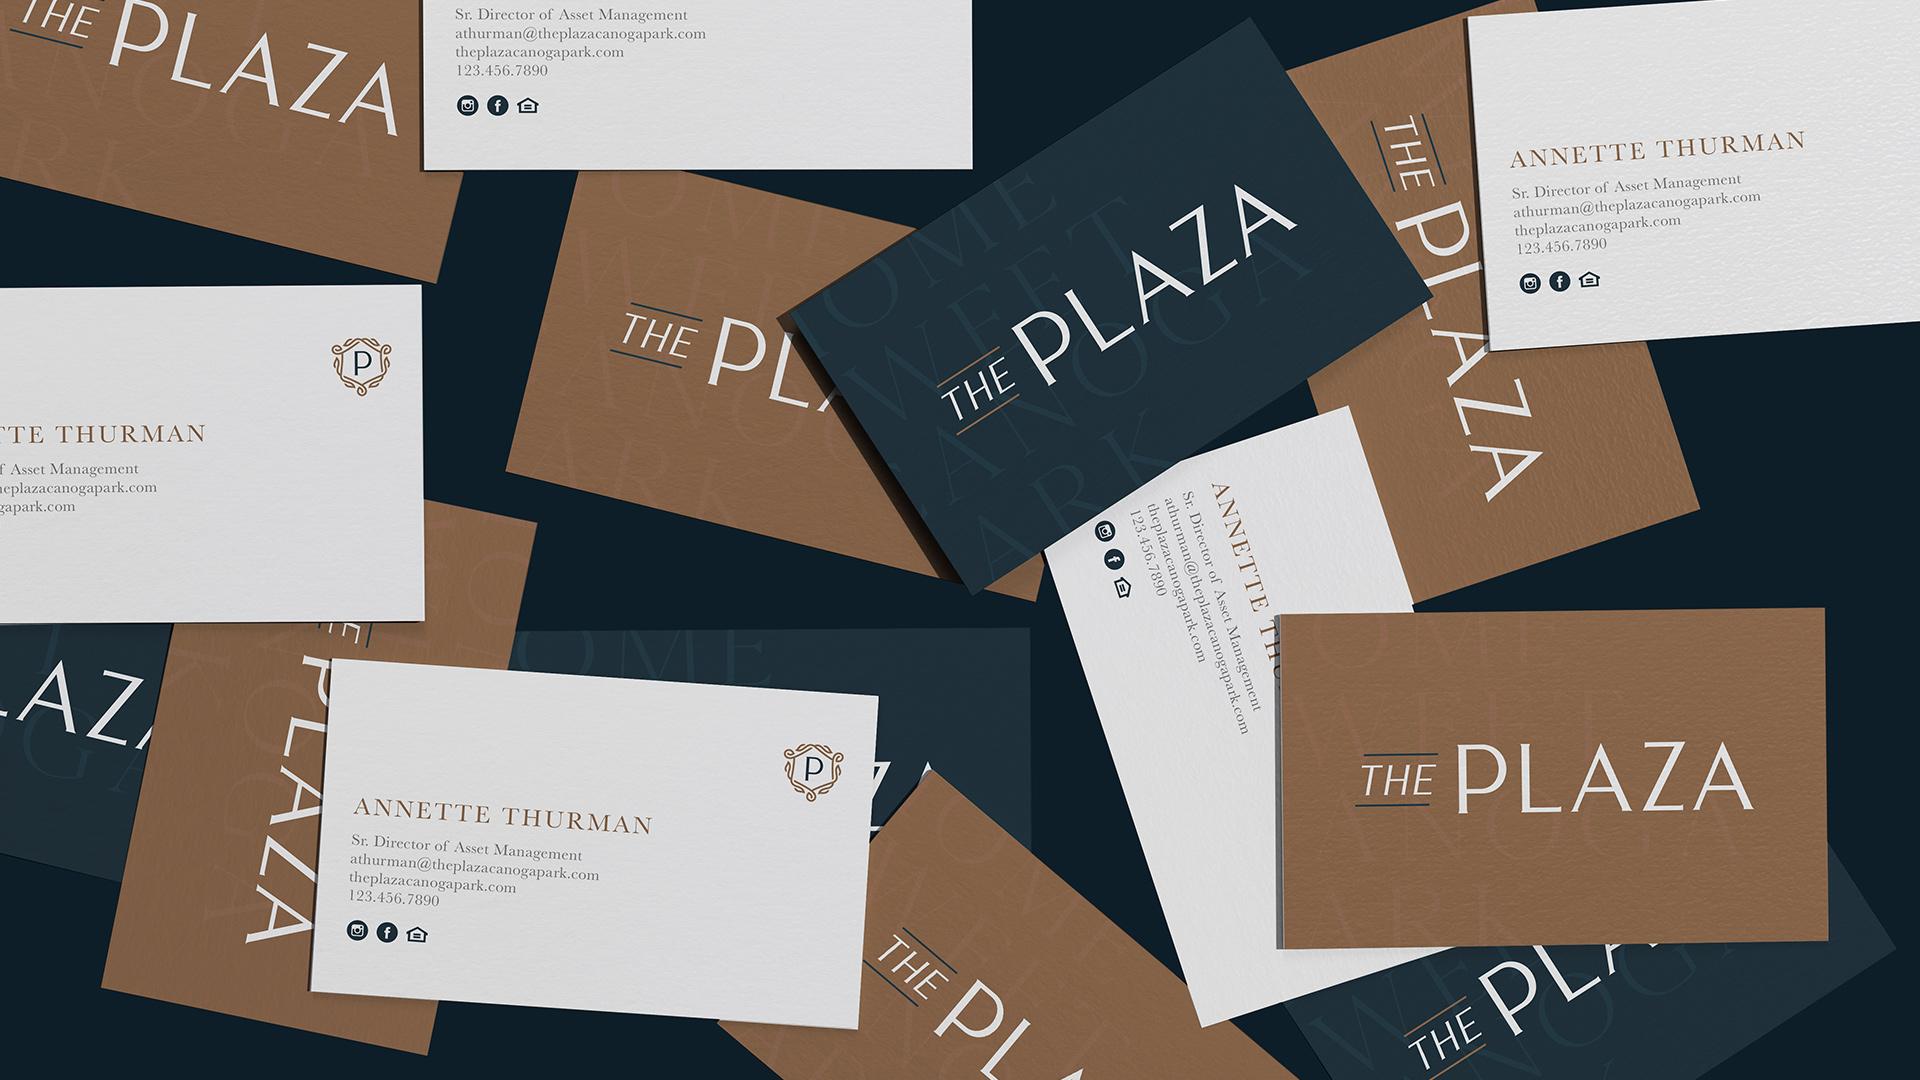 The Plaza Raintree Partners Business Cards - Unsung Studio Branding